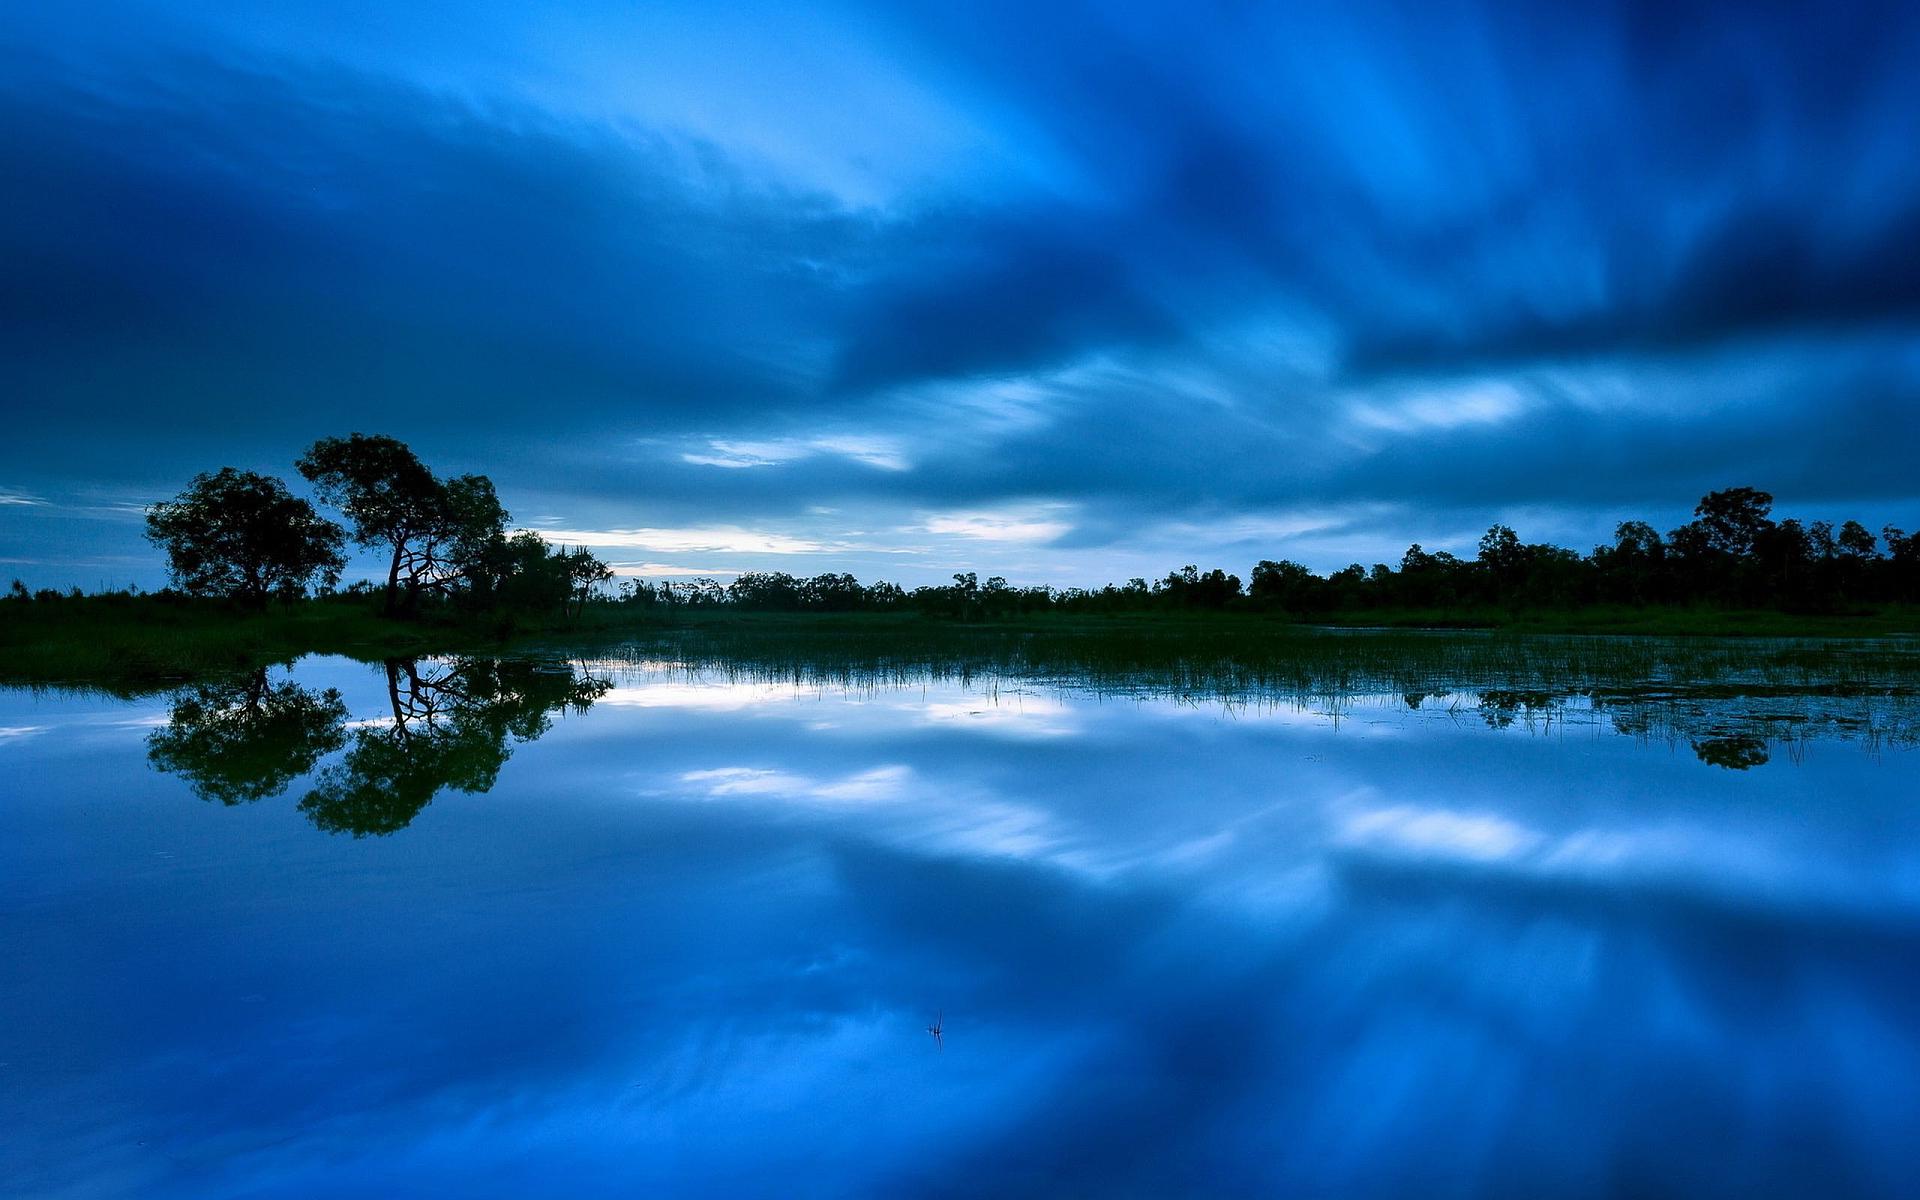 lake backgrounds cool - HD Desktop Wallpapers | 4k HD